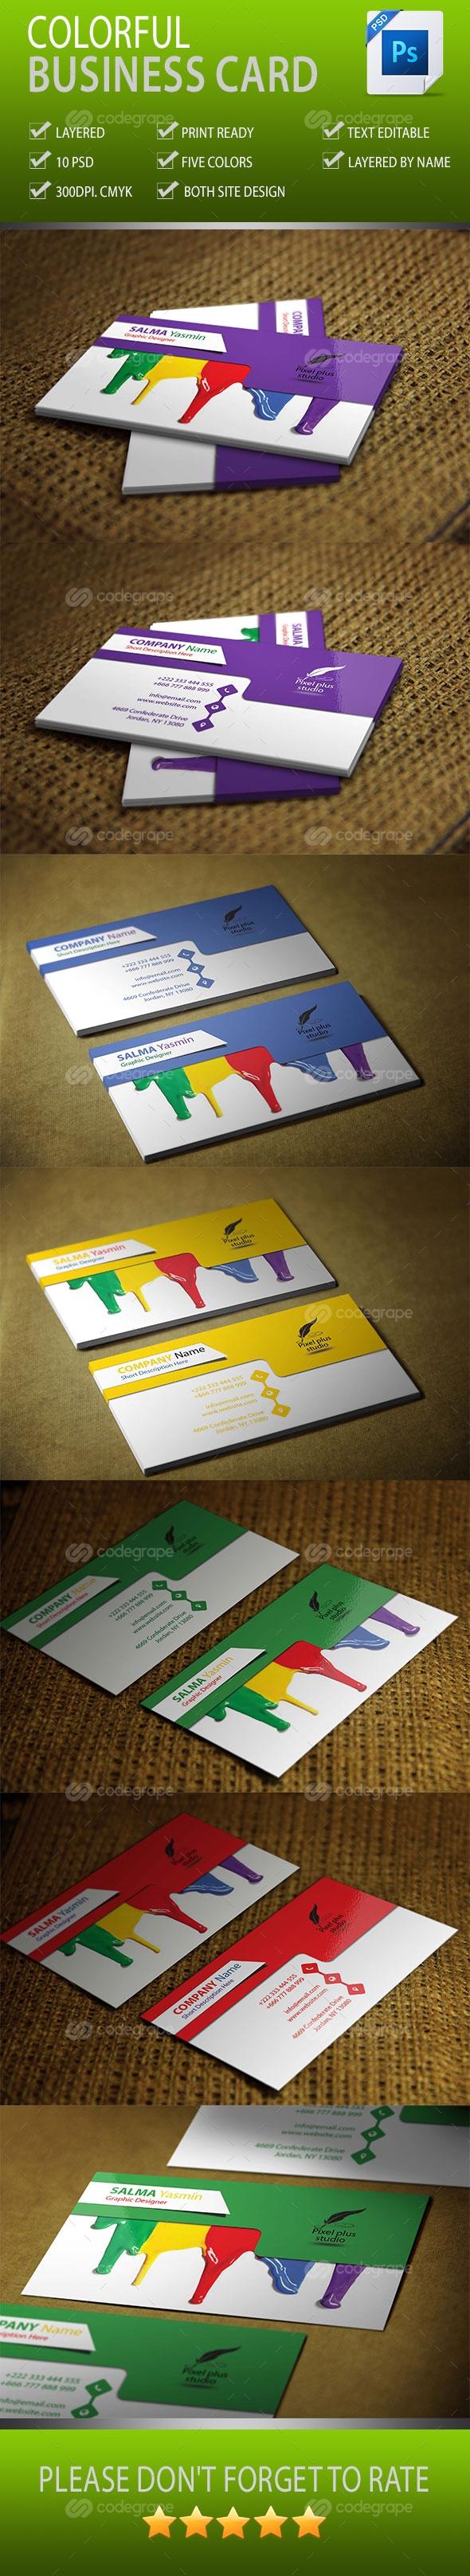 Colorful Business Cards Vol-1.0 Five Colors